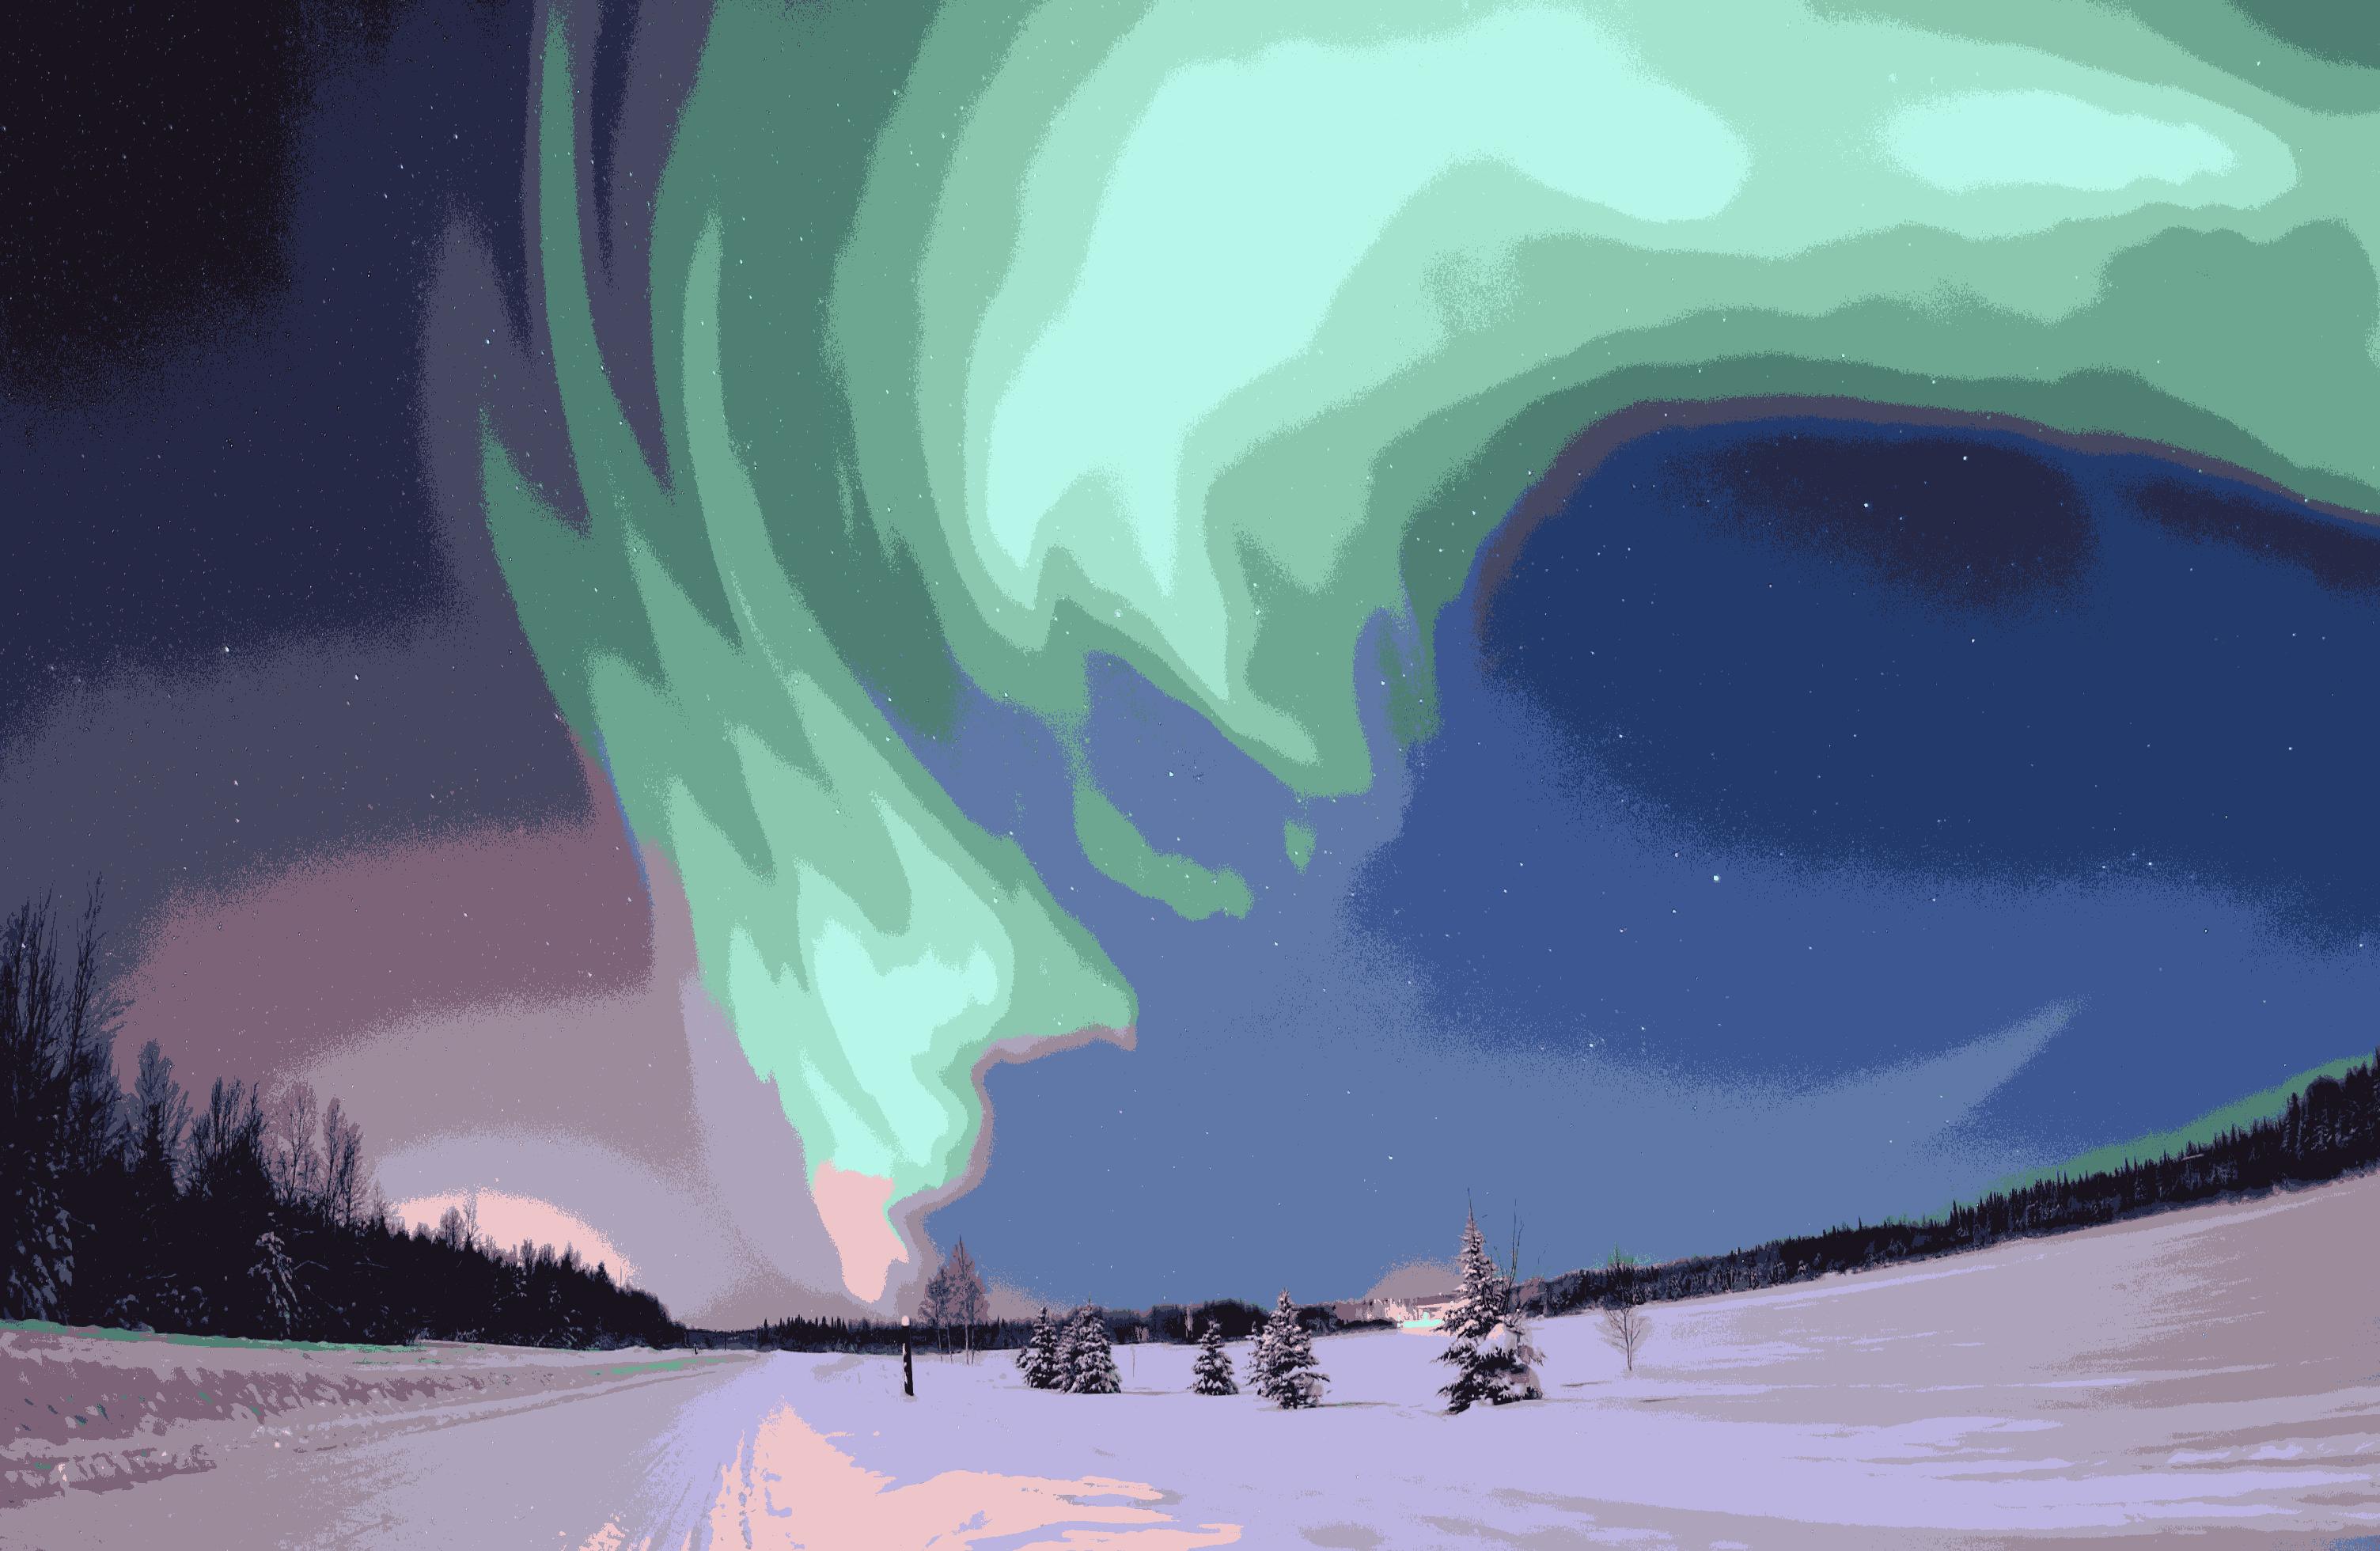 File:Polarlicht 2 kmeans 16 large.png.